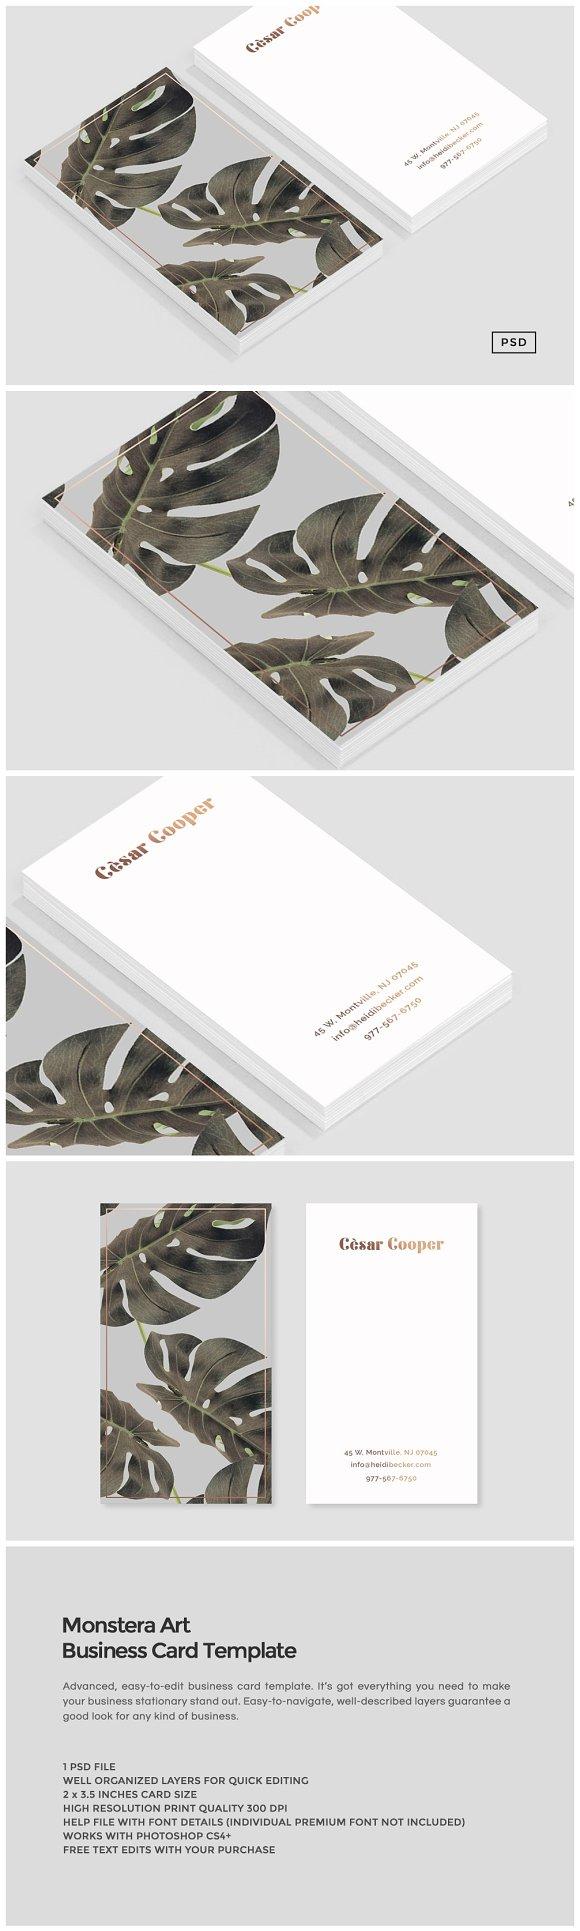 Monstera art business card template business card templates monstera art business card template business card templates creative market reheart Images